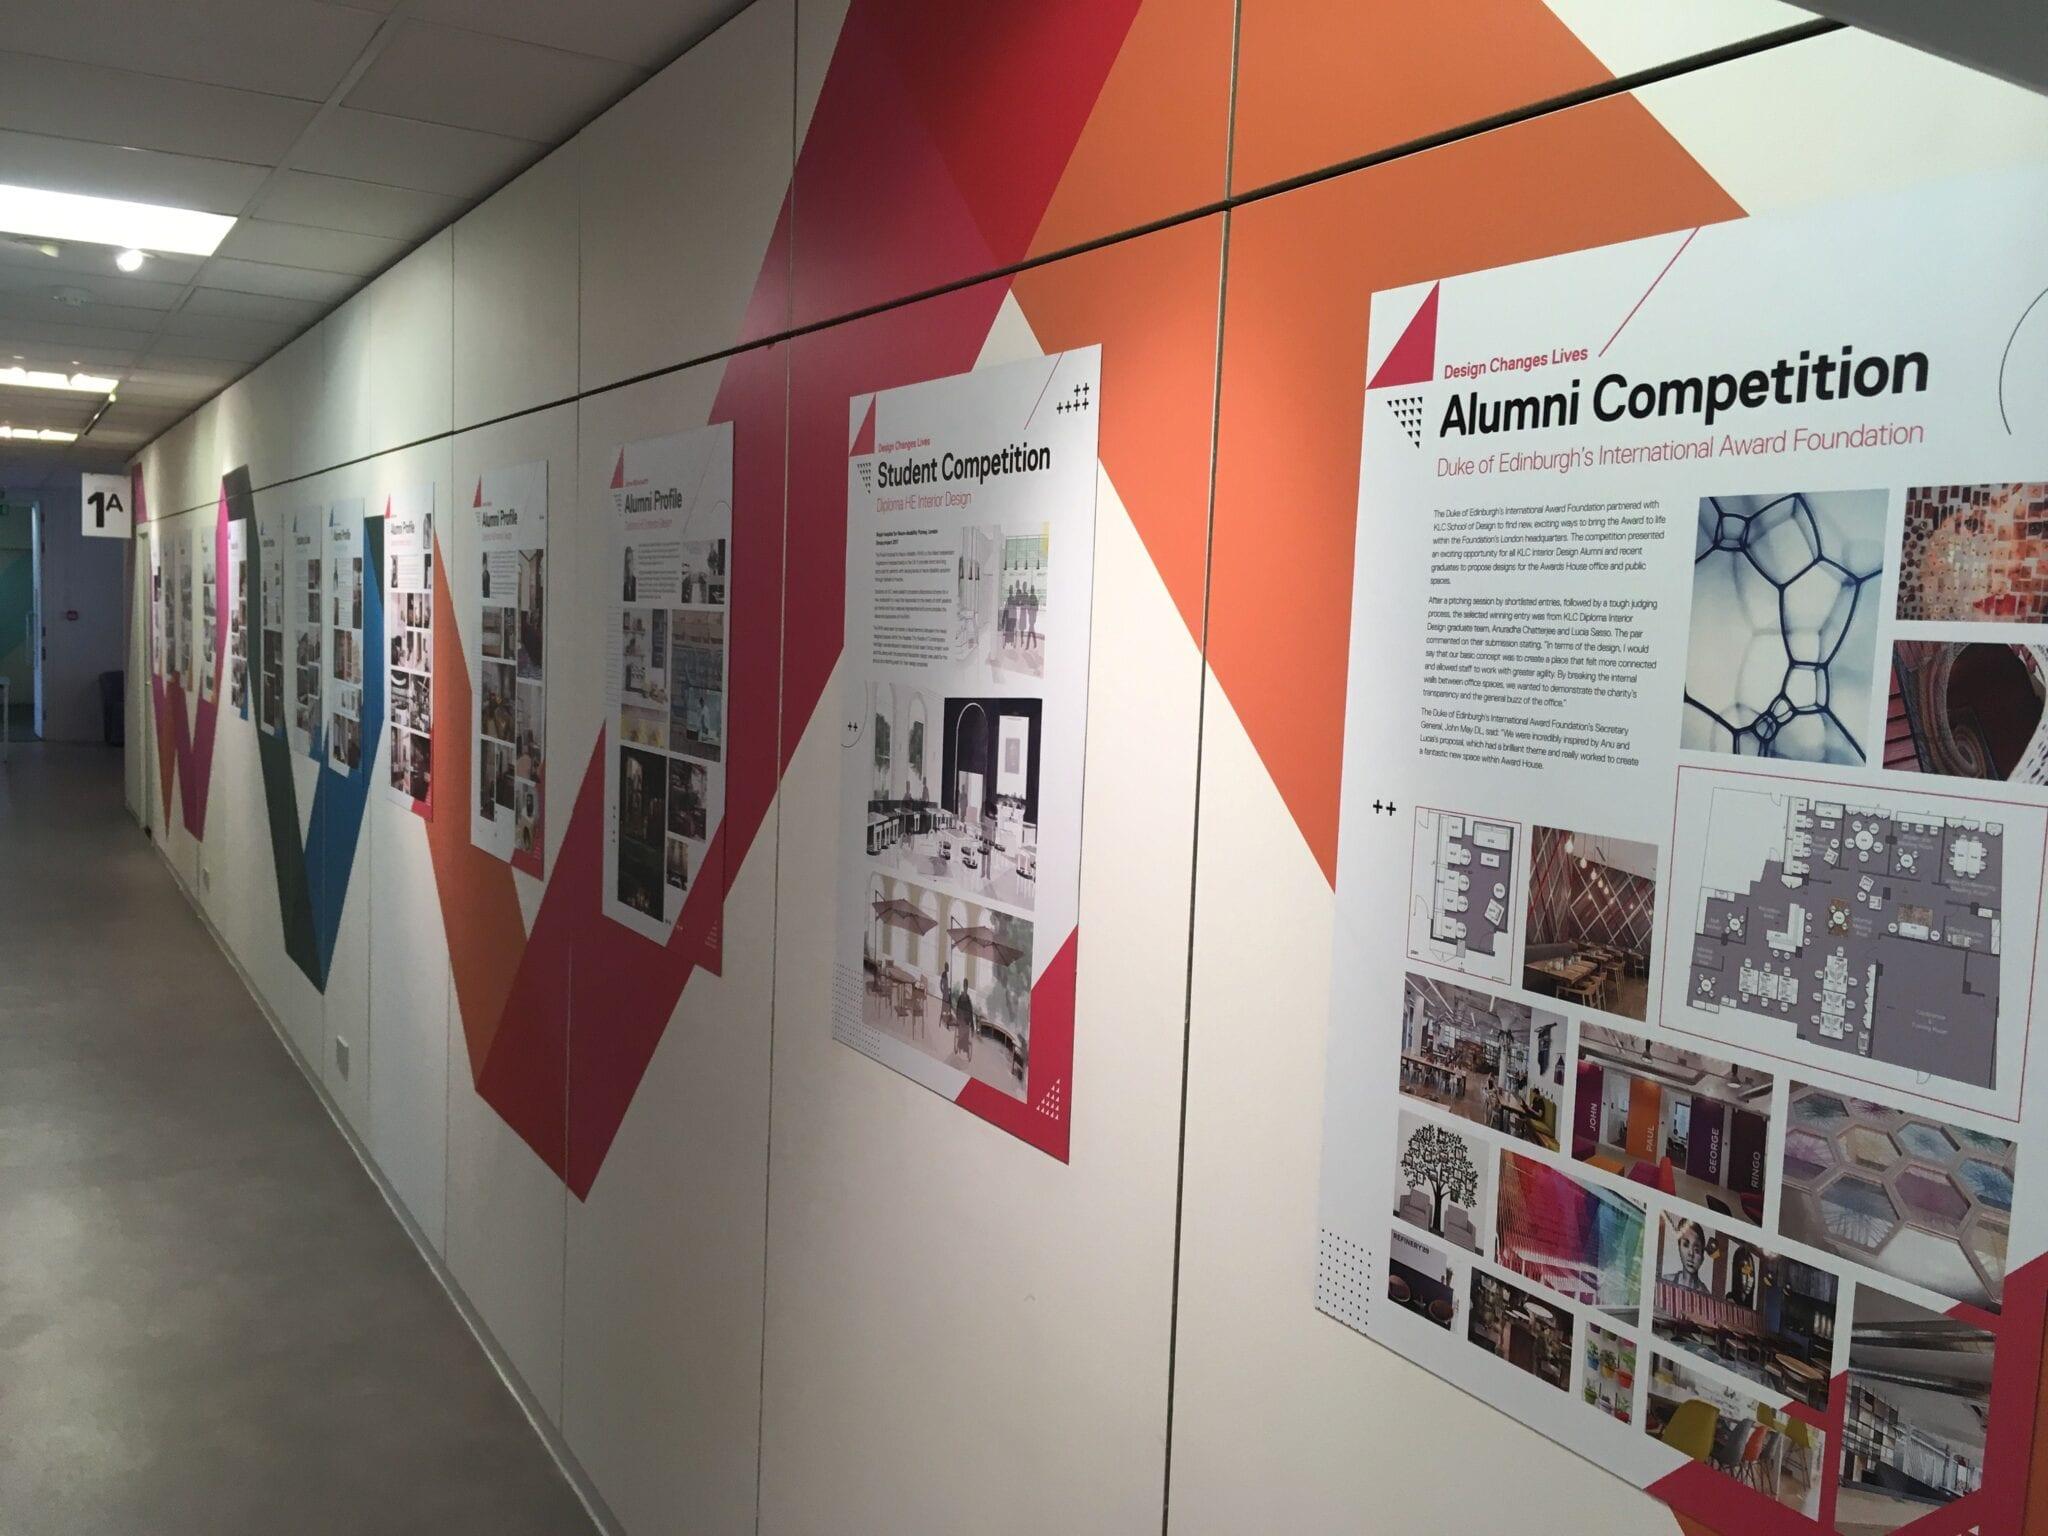 School Wall Art Graphic Display Solutions Amp Wayfinding